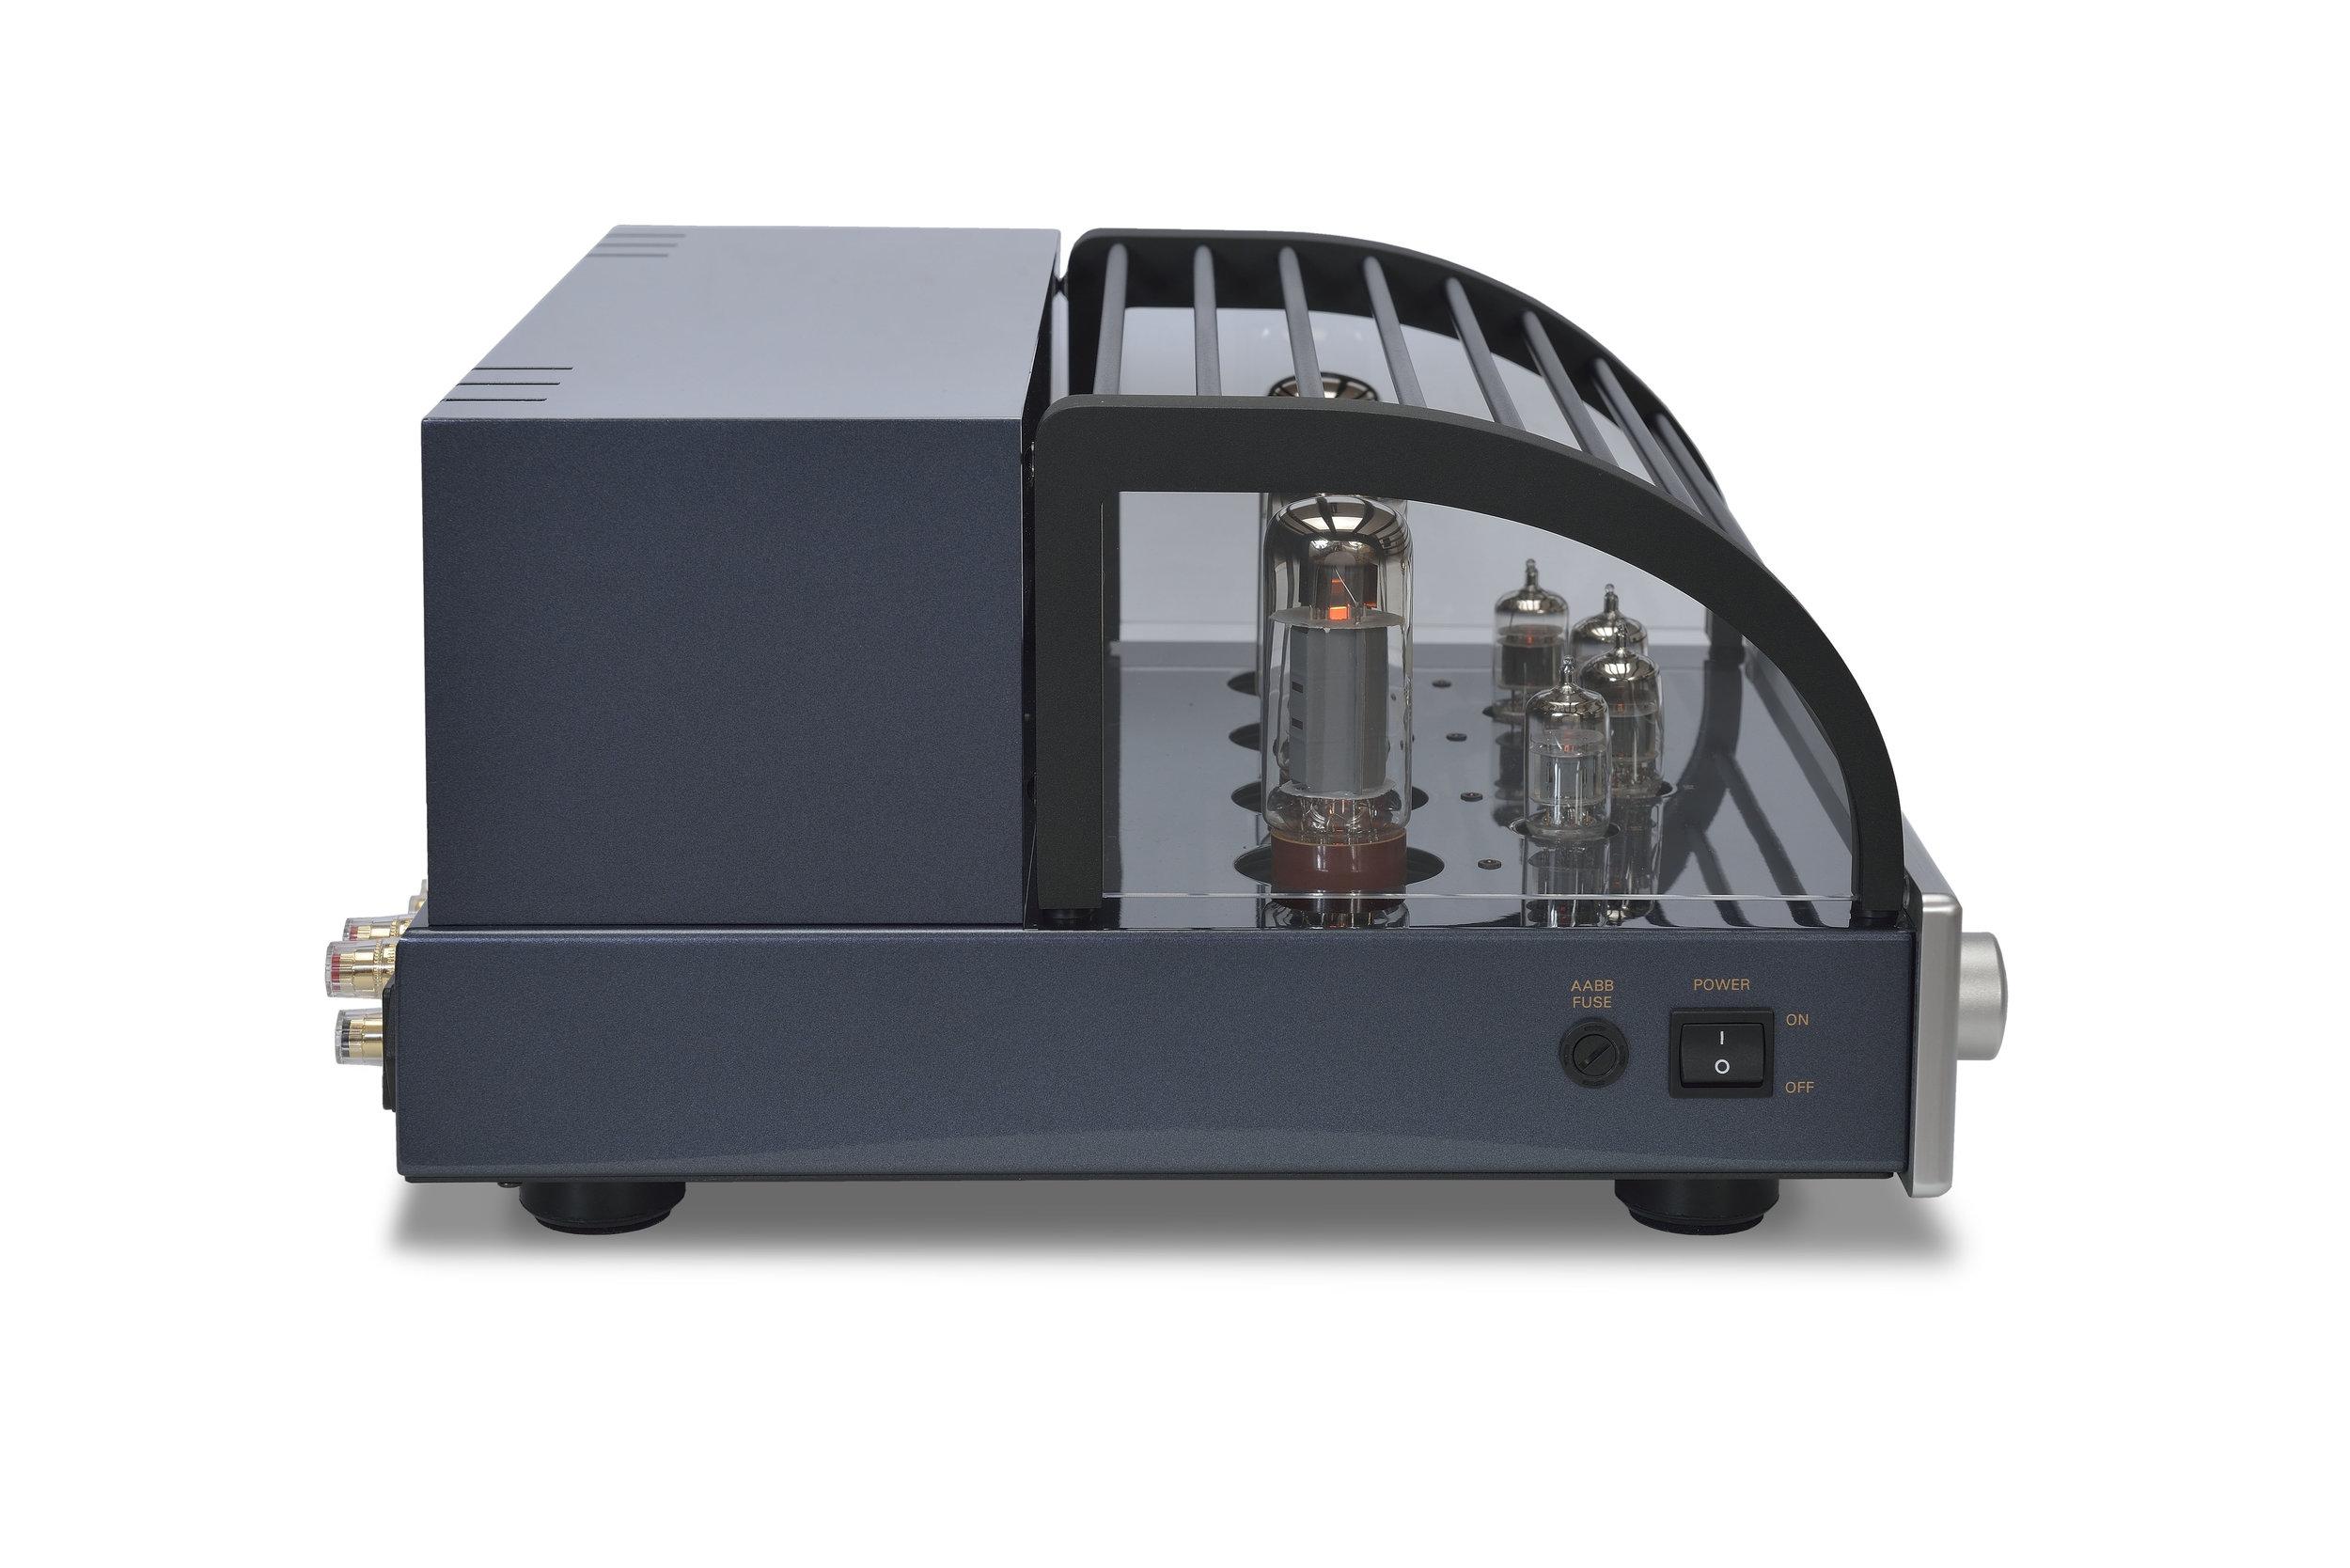 105b - PrimaLuna Evo 200 Tube Integrated Amplifier - silver - quarter turned - white background.jpg